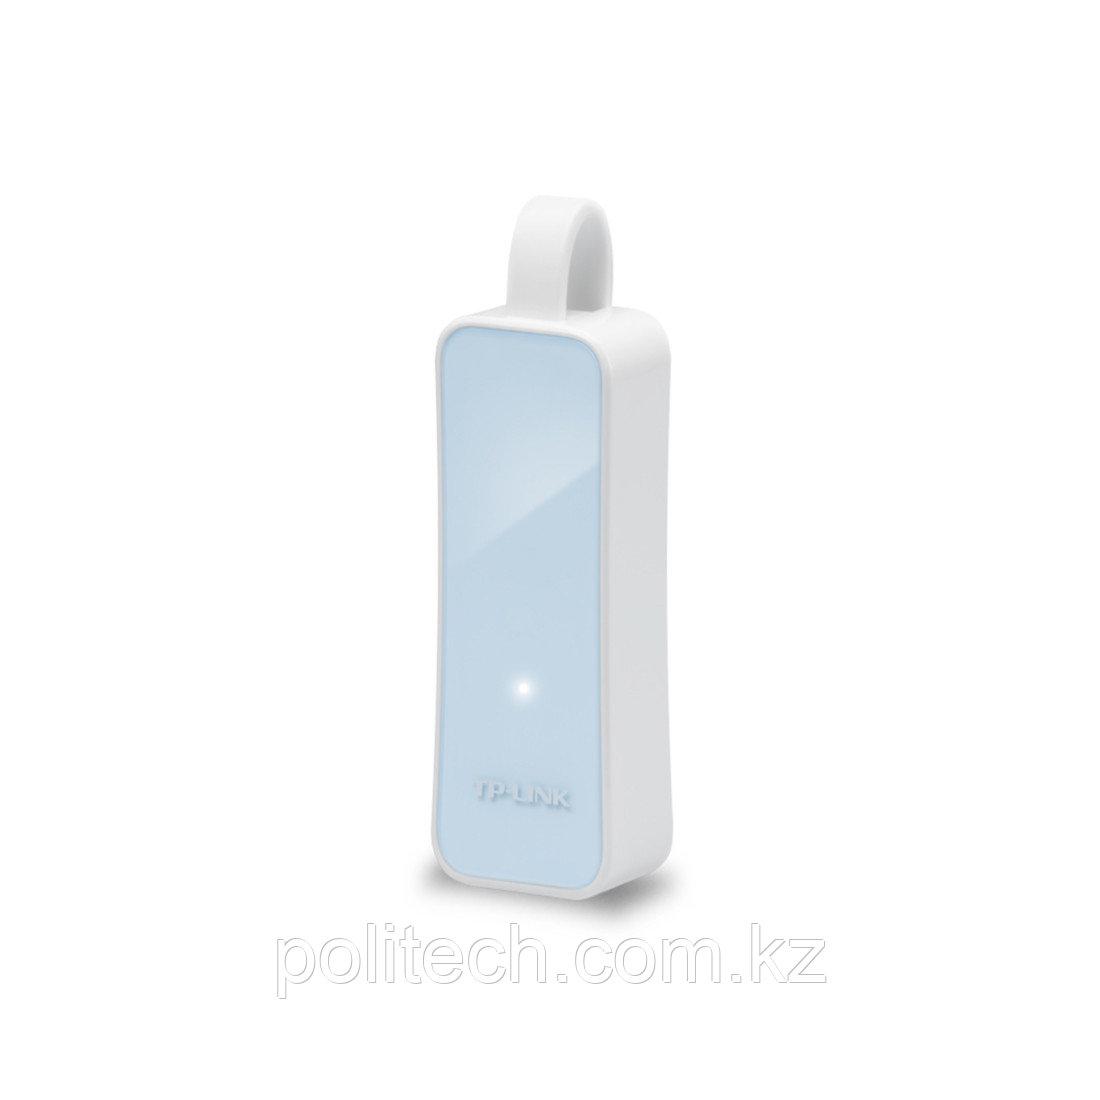 Сетевой адаптер USB TP-Link UE200